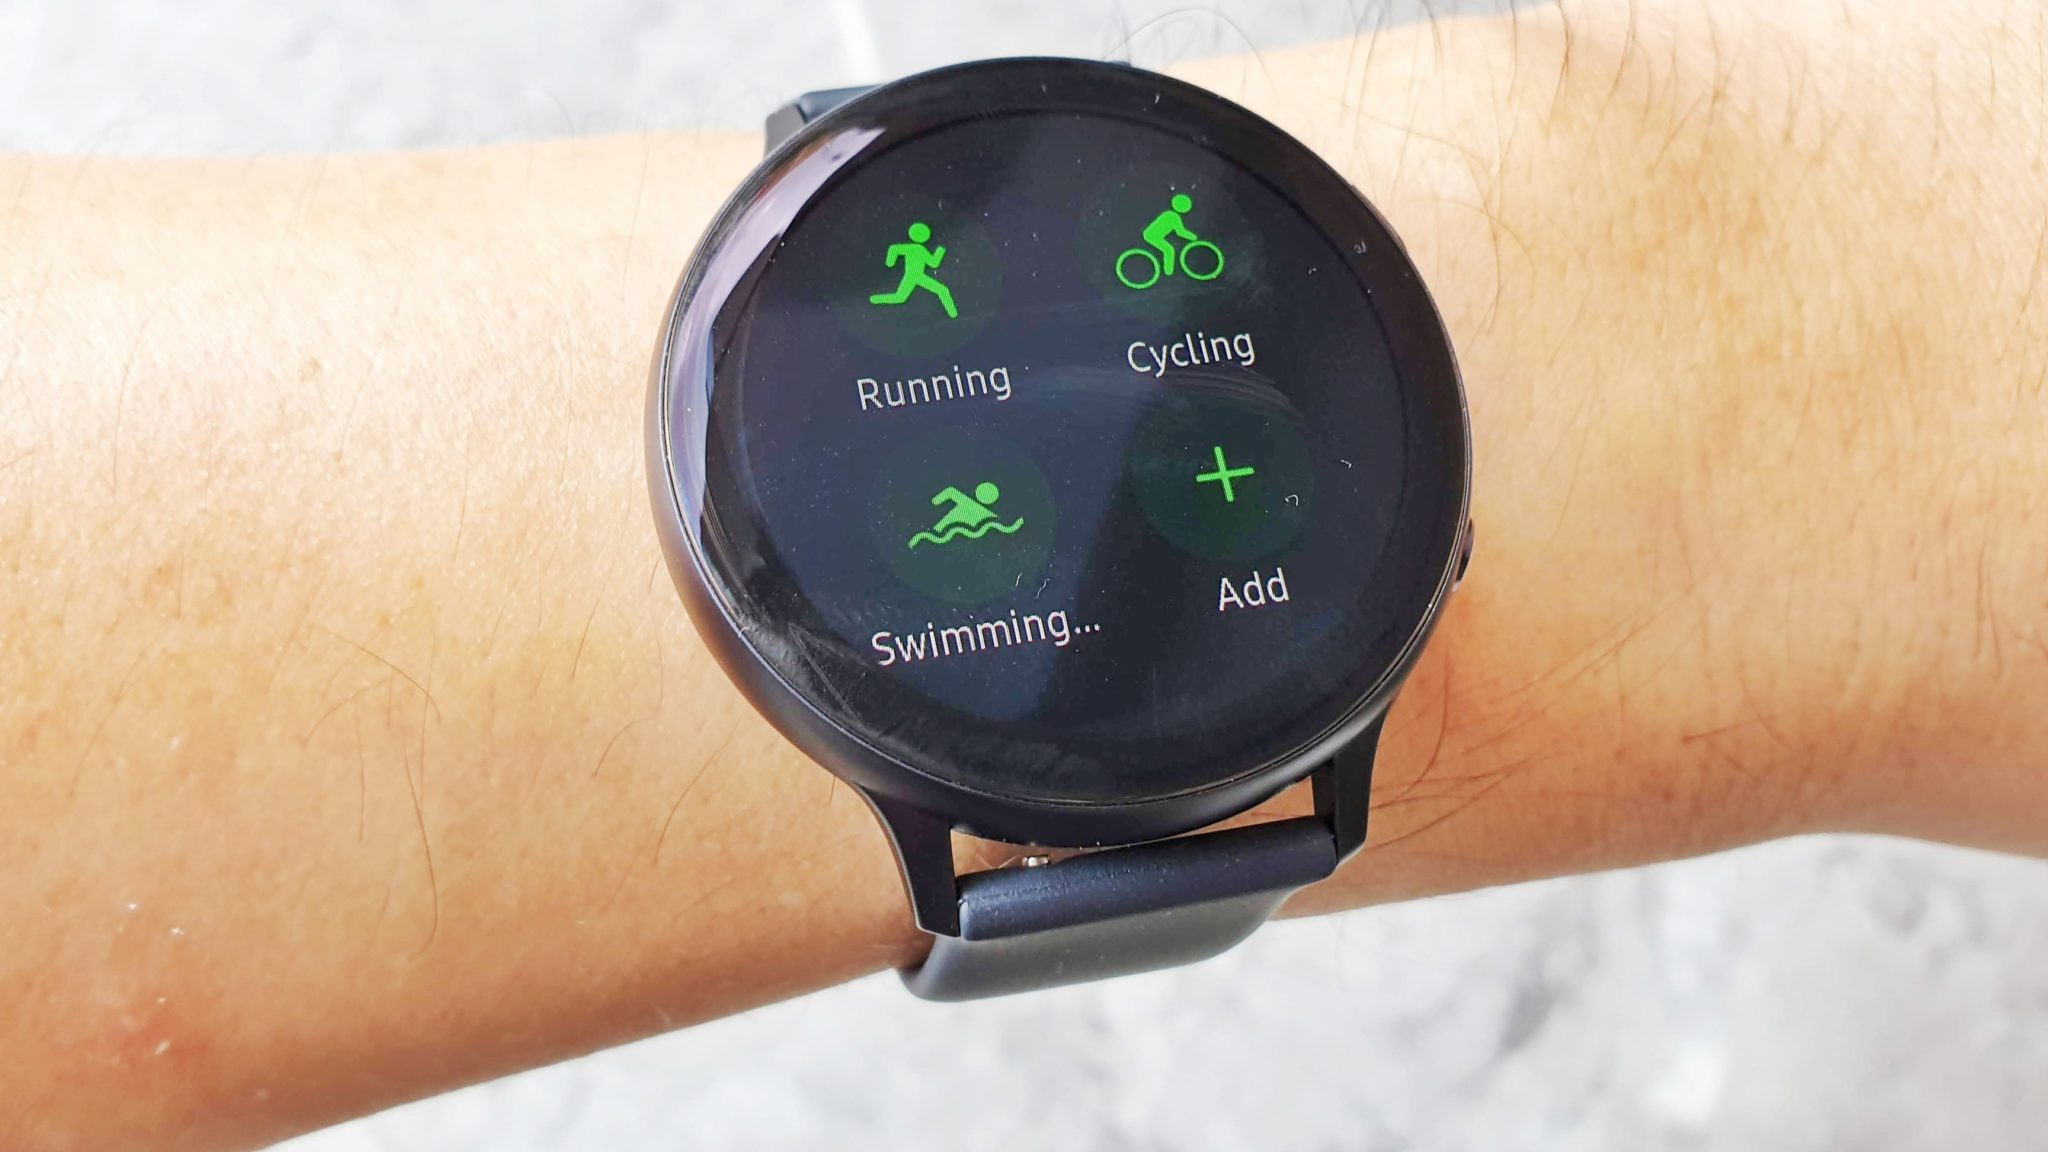 Watch Active2 exercises